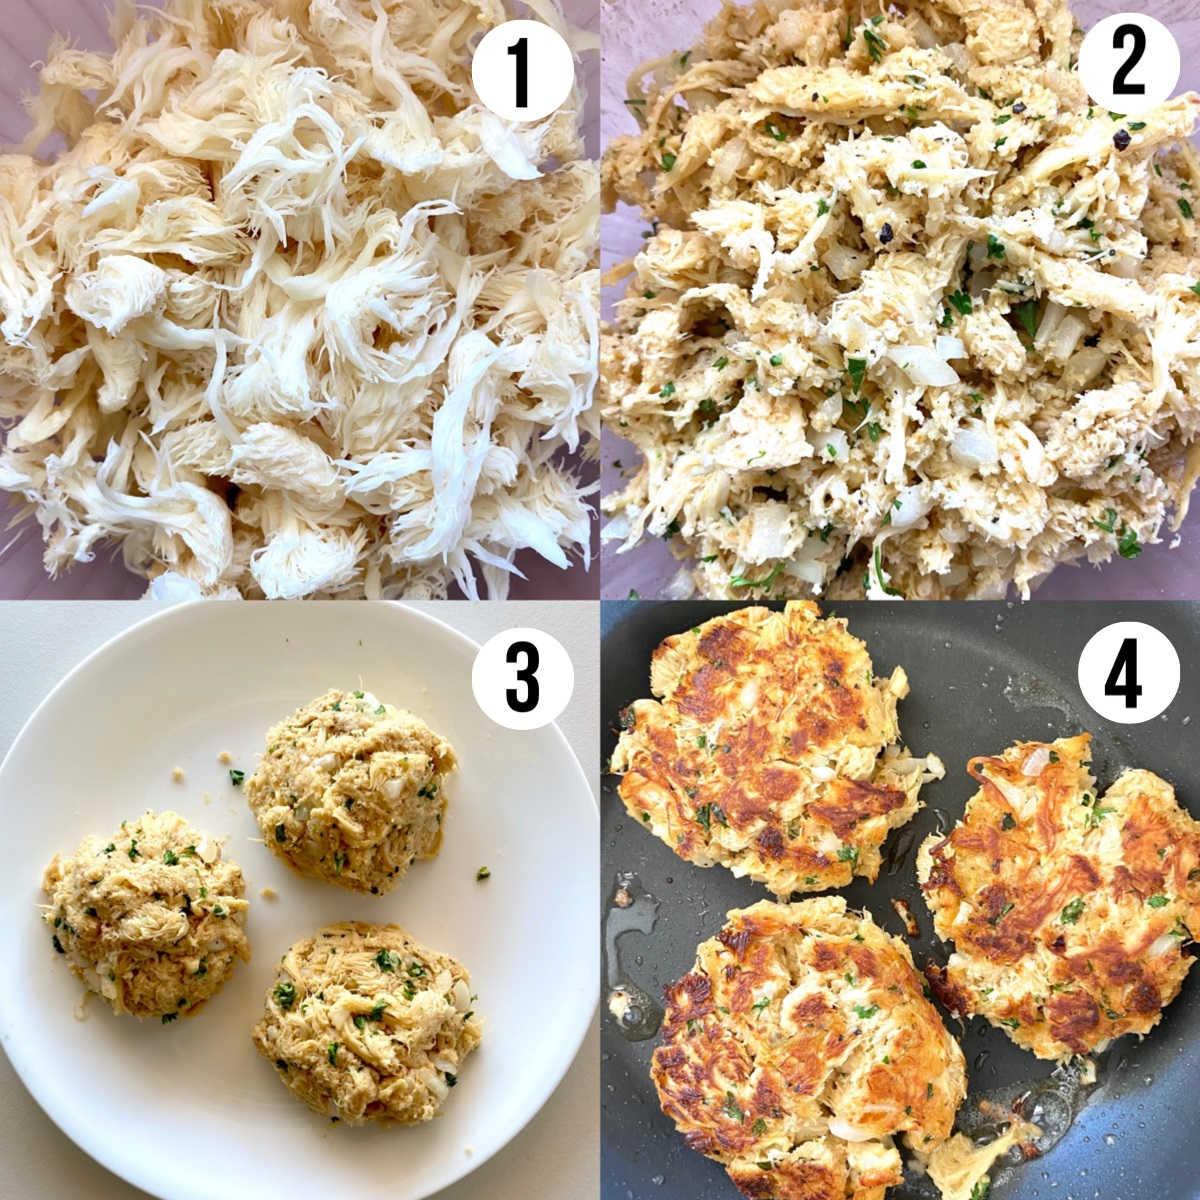 lions mane mushroom crab cakes process shots 1 through 4